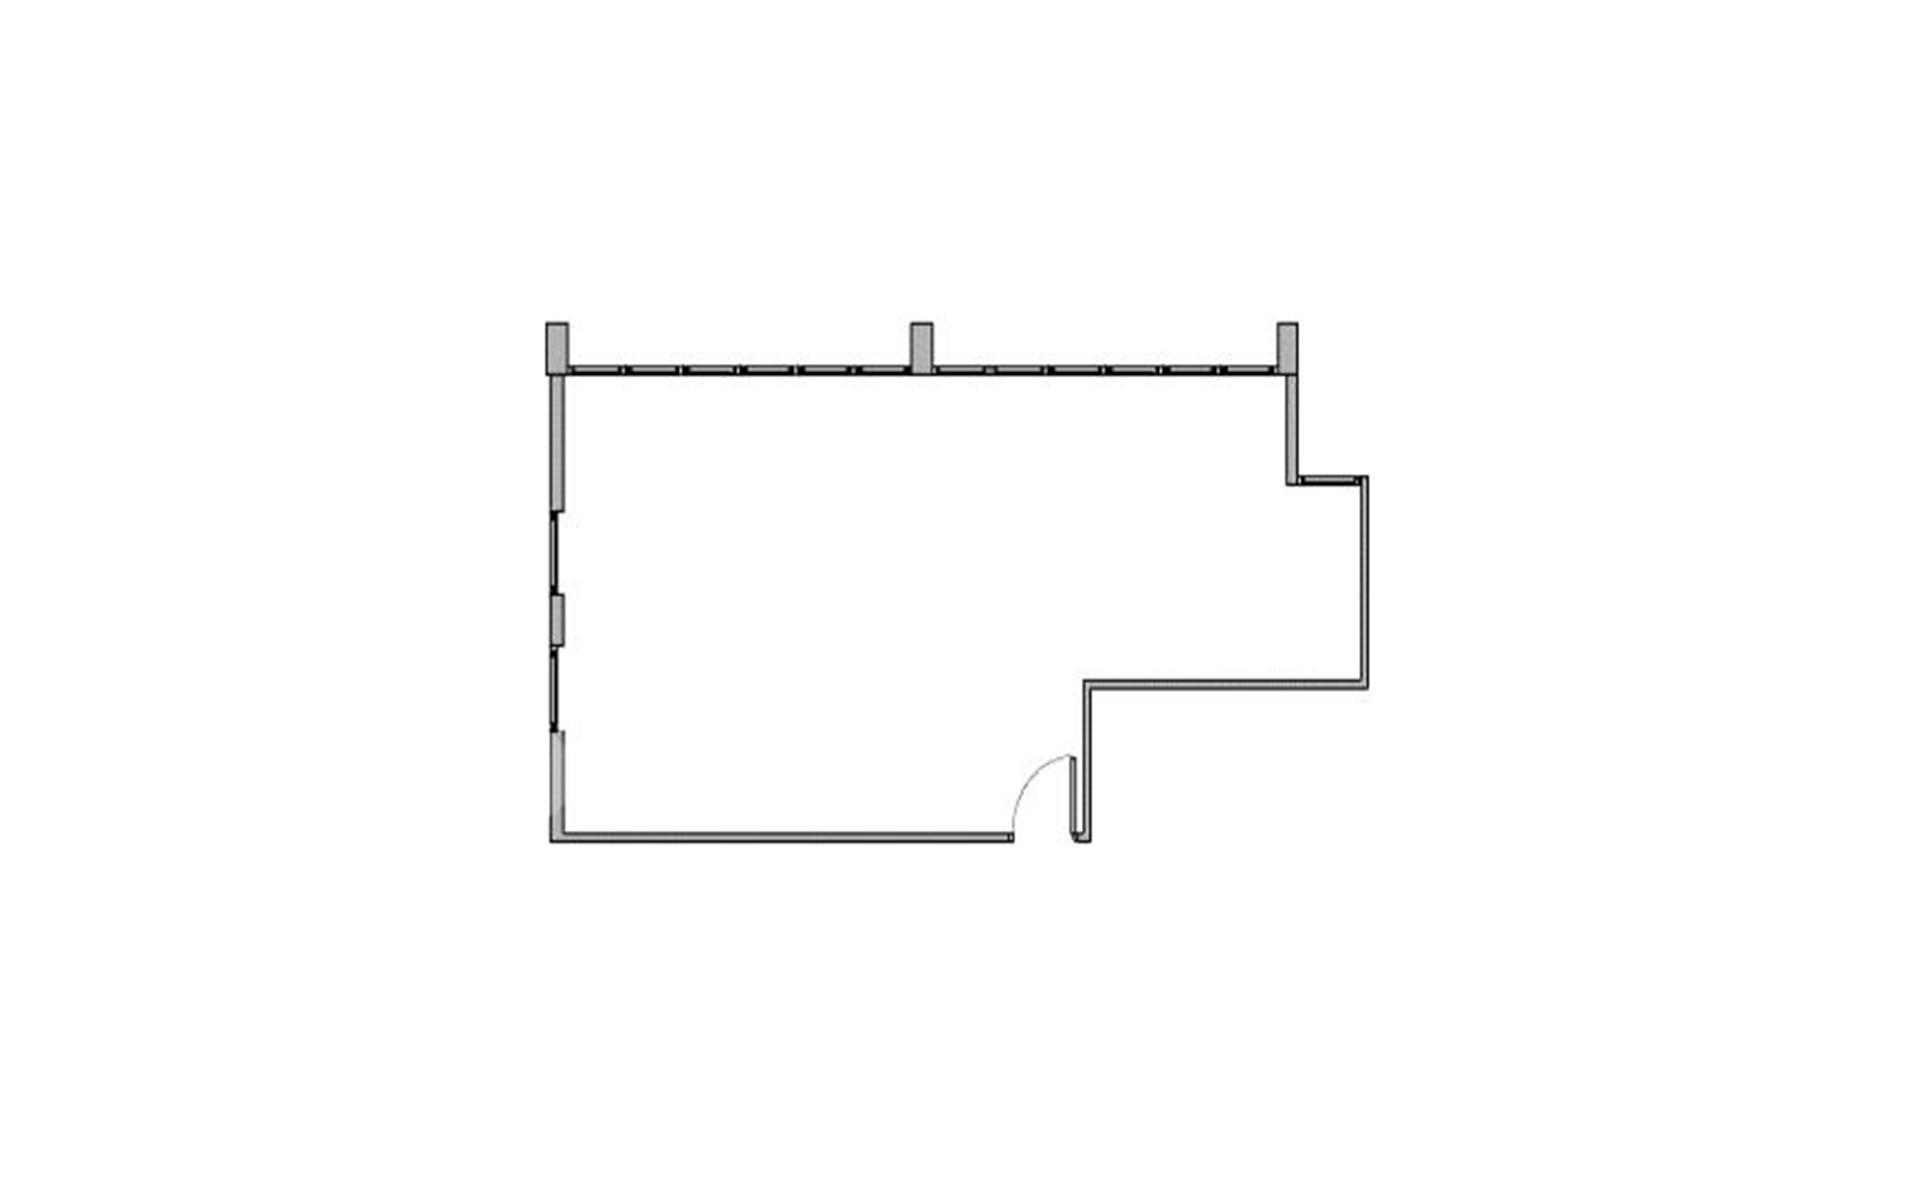 Boxer - Clock Tower Square - Team Space | Suite 5-180